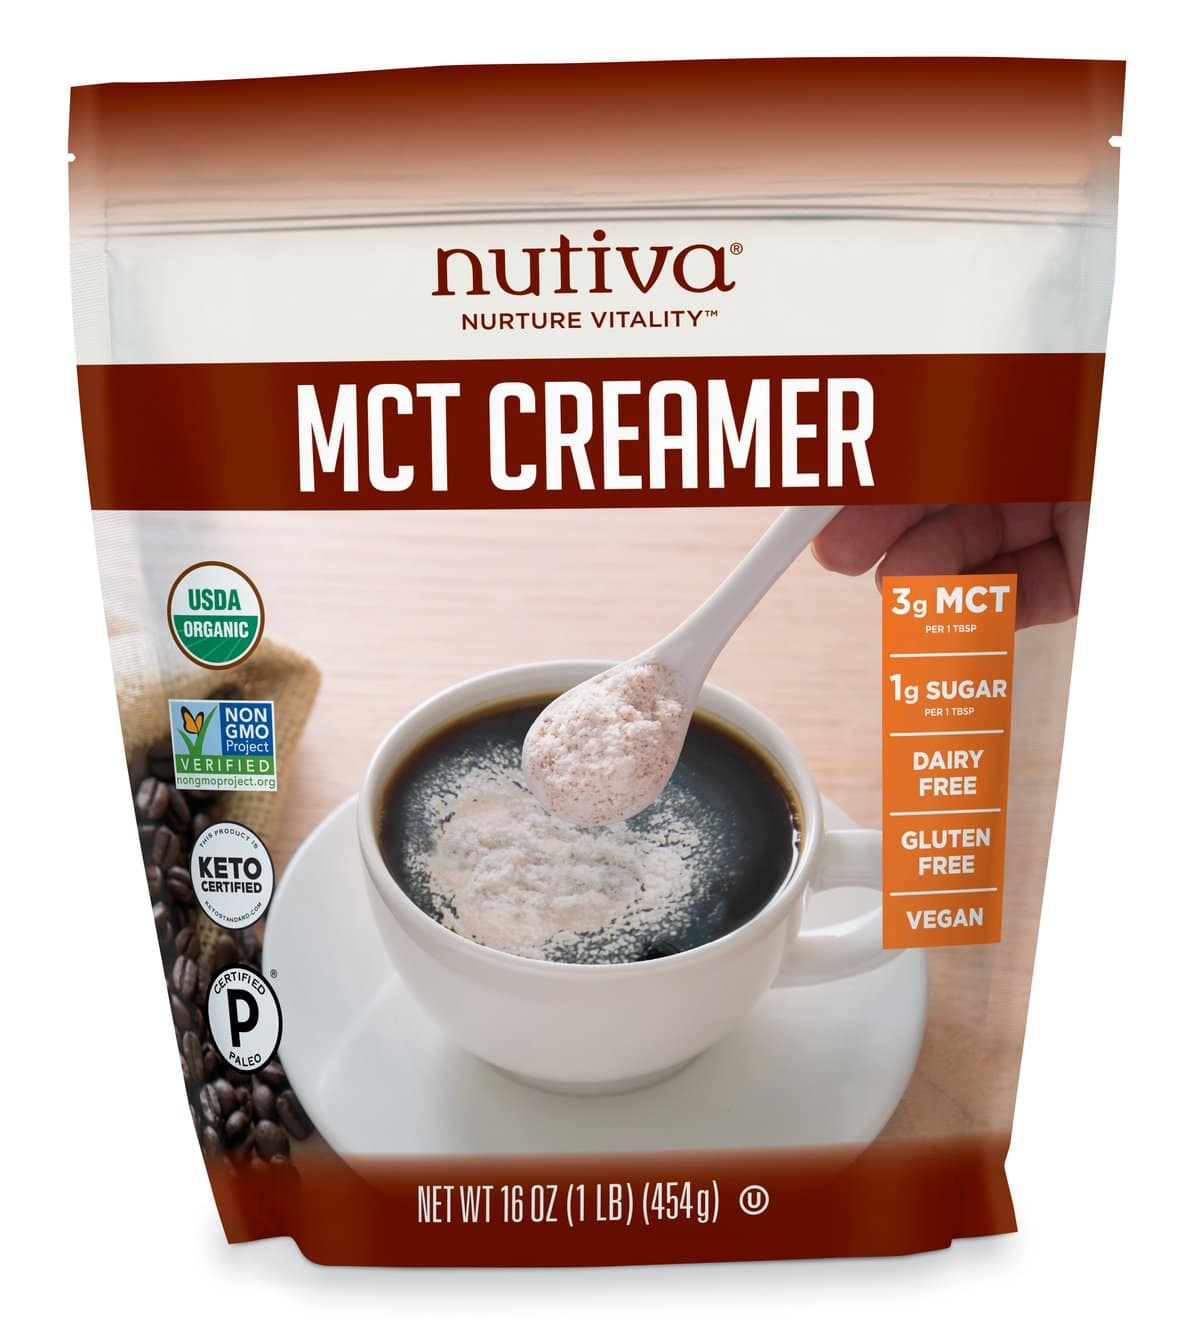 Nutiva Launches Organic MCT Creamer